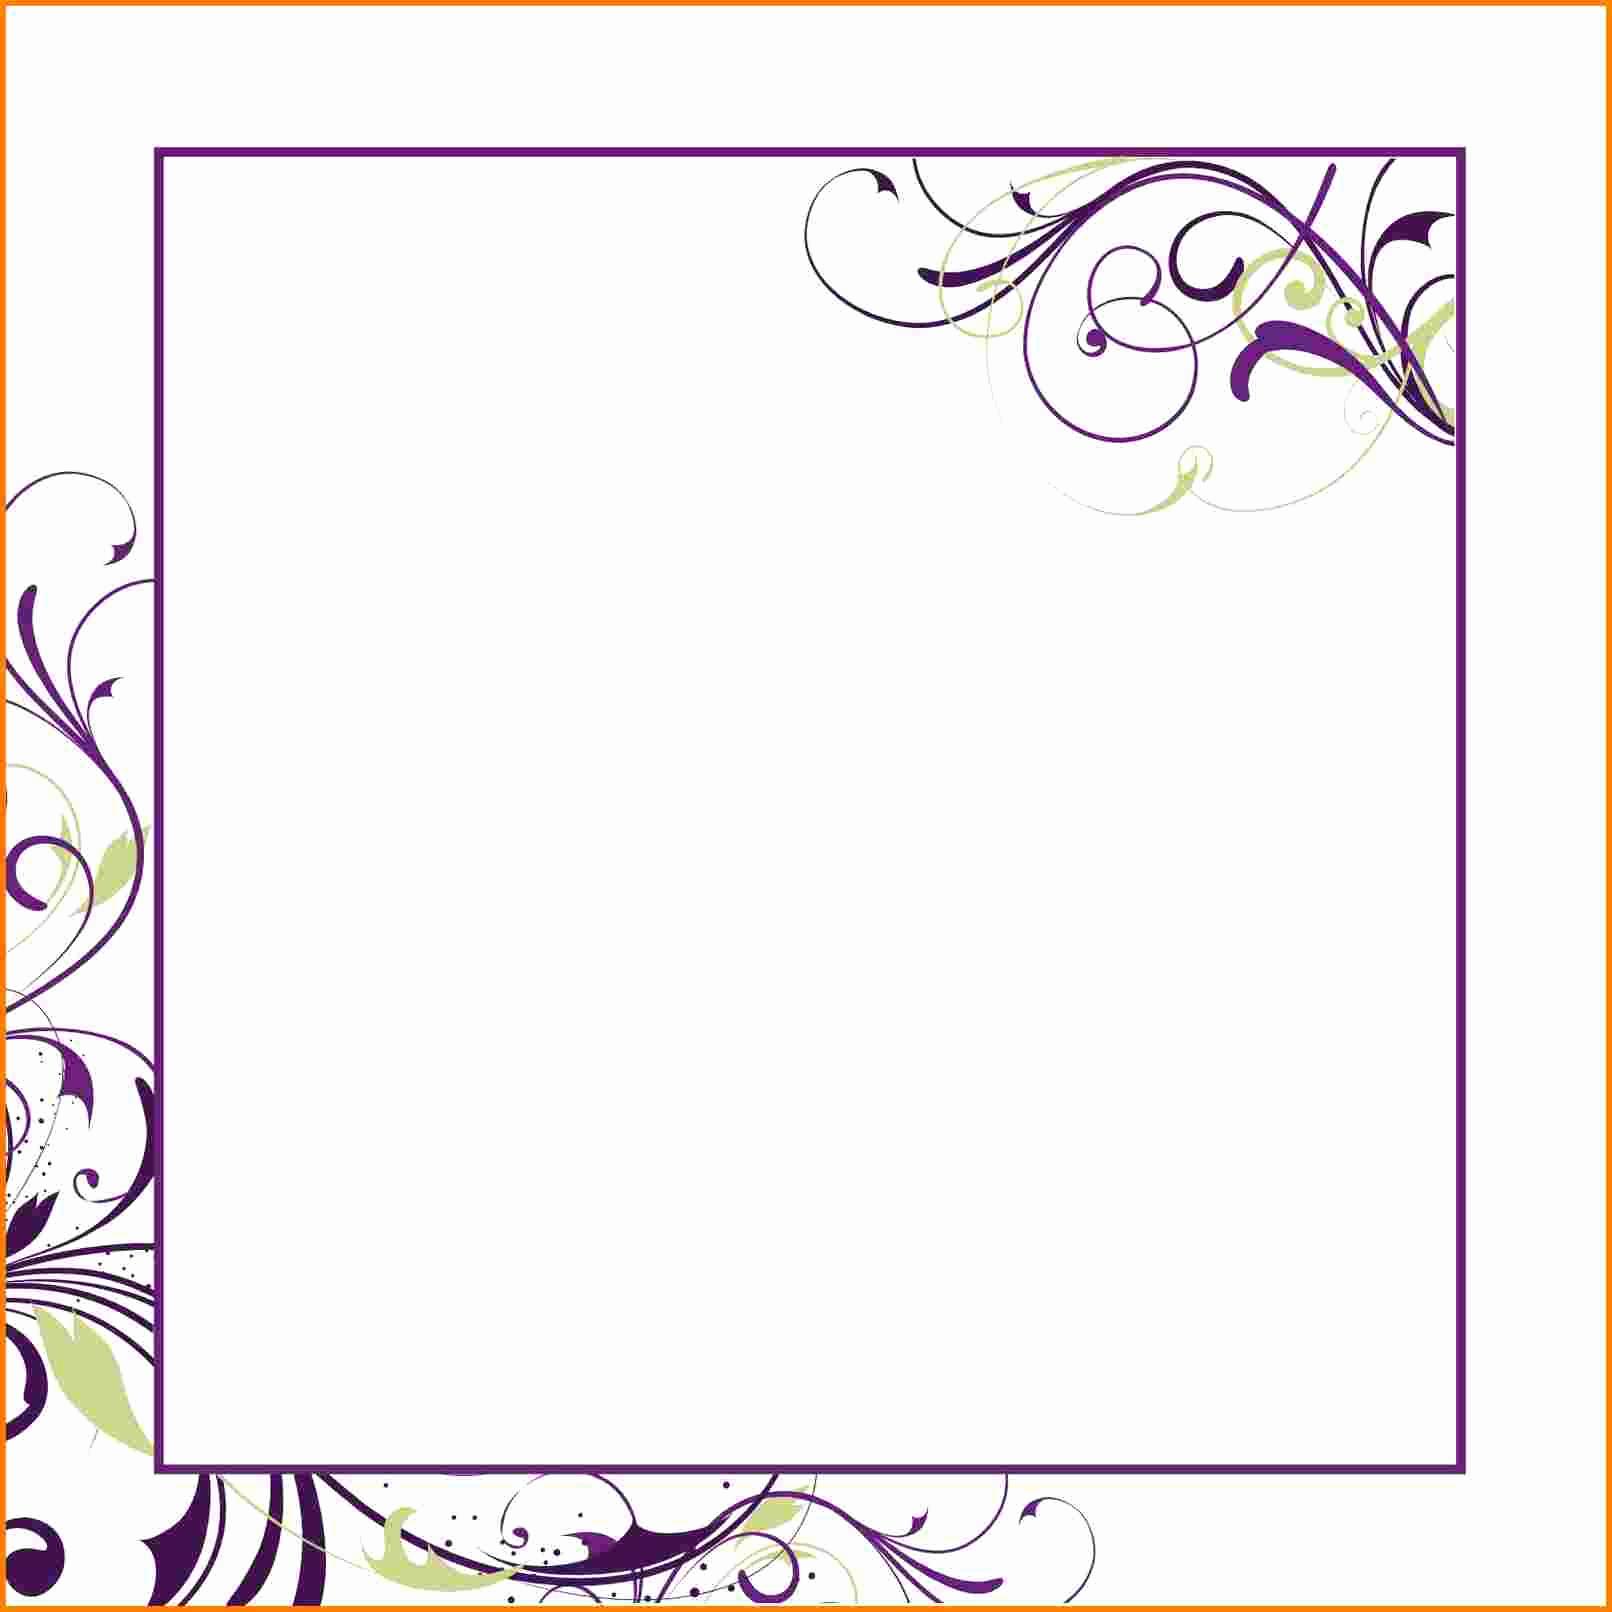 Blank Wedding Invitation Templates Best Of Blank Invitation Templates for Microsoft Word